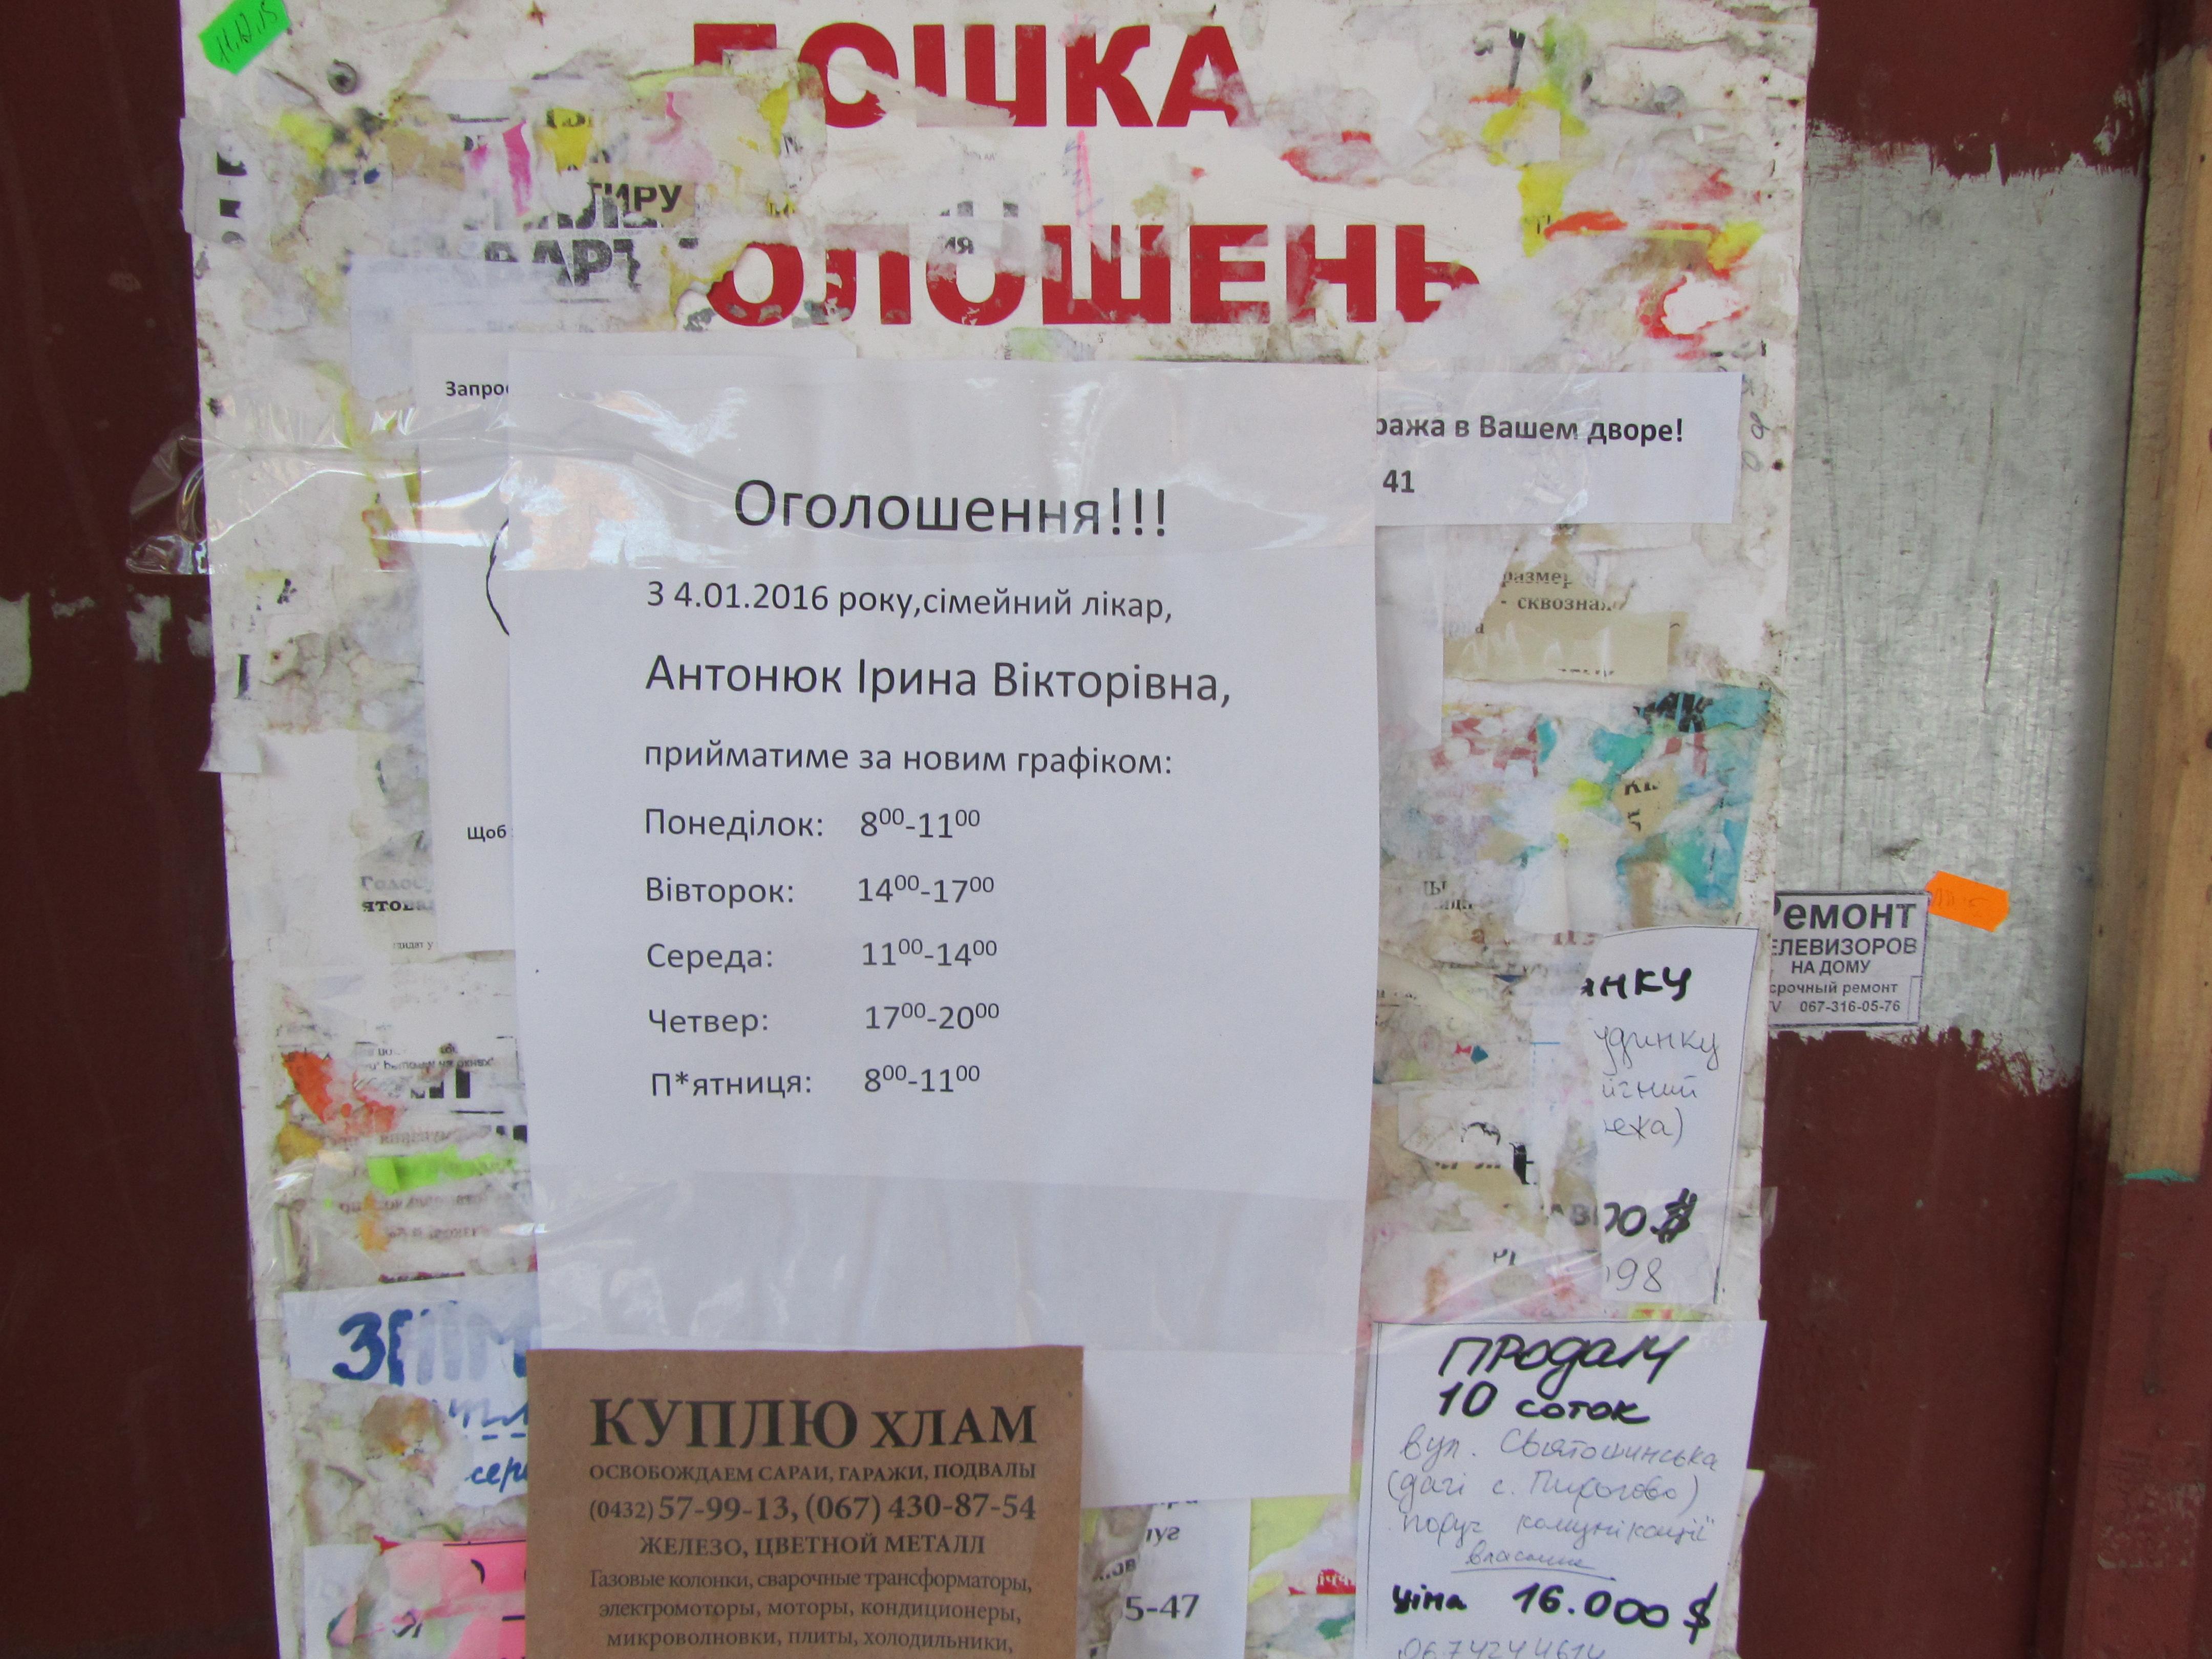 Объявление на дверях в подъезд